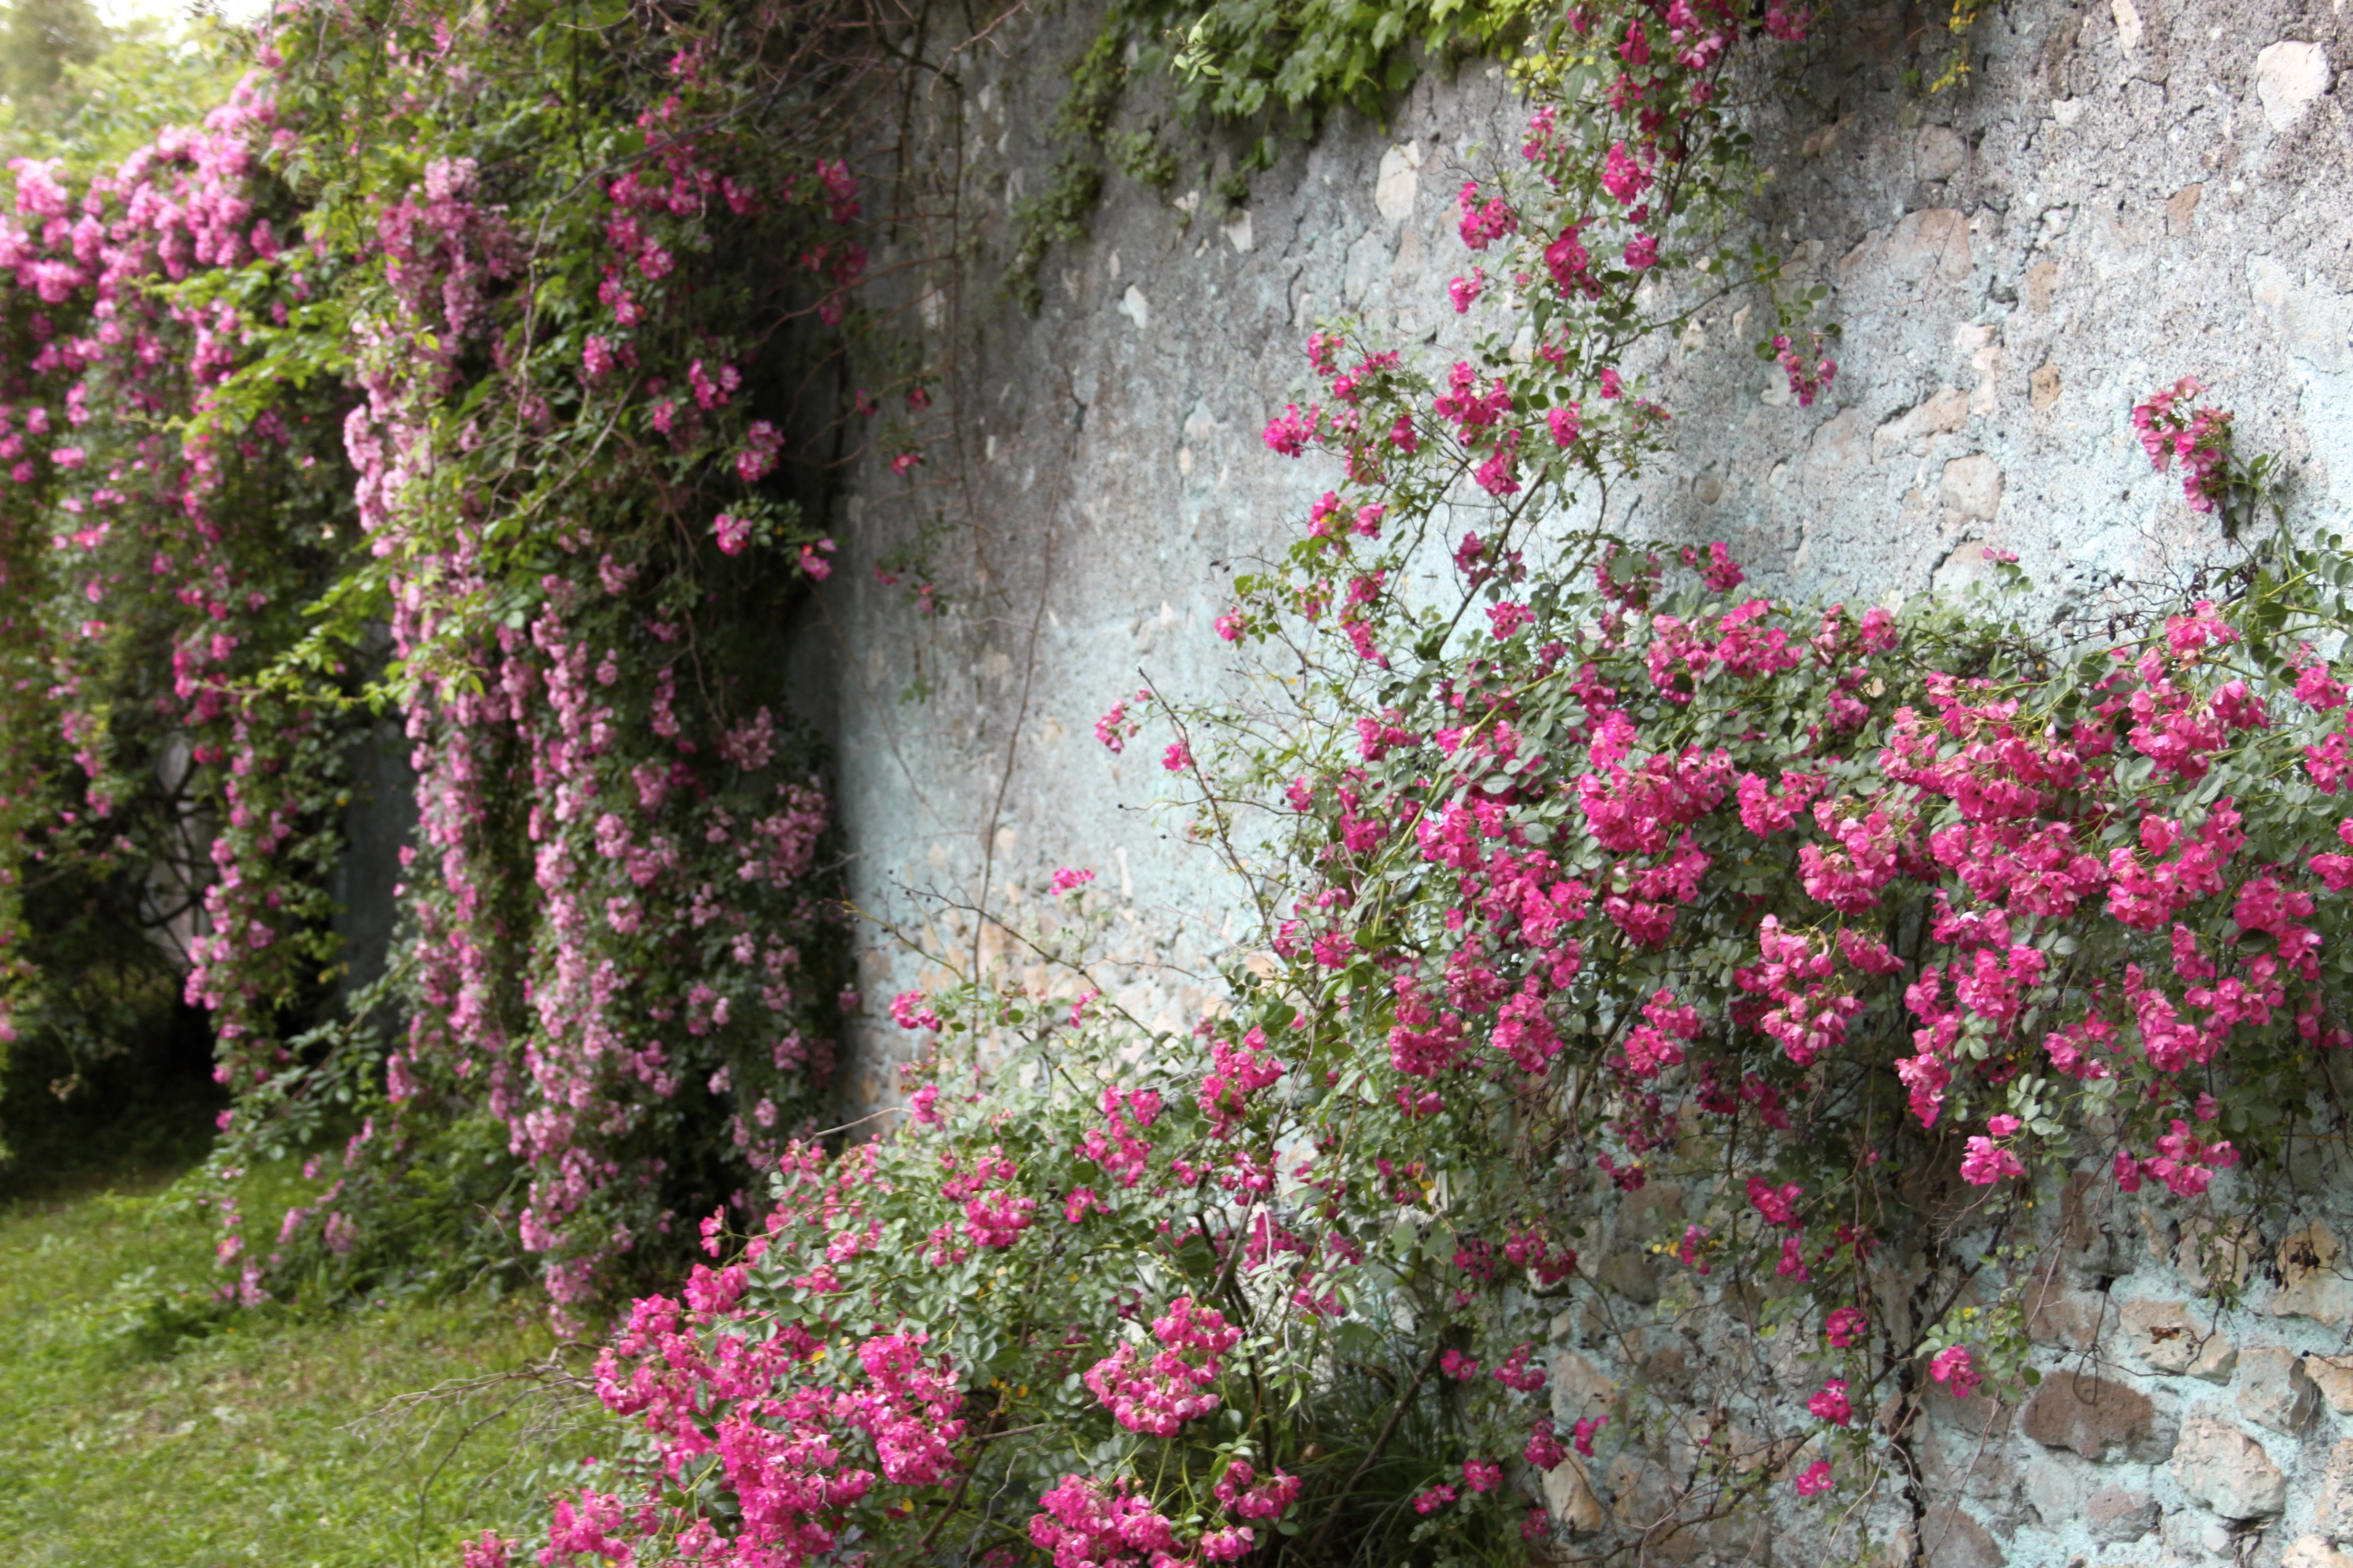 Garden of Ninfa near Sermoneta Italy